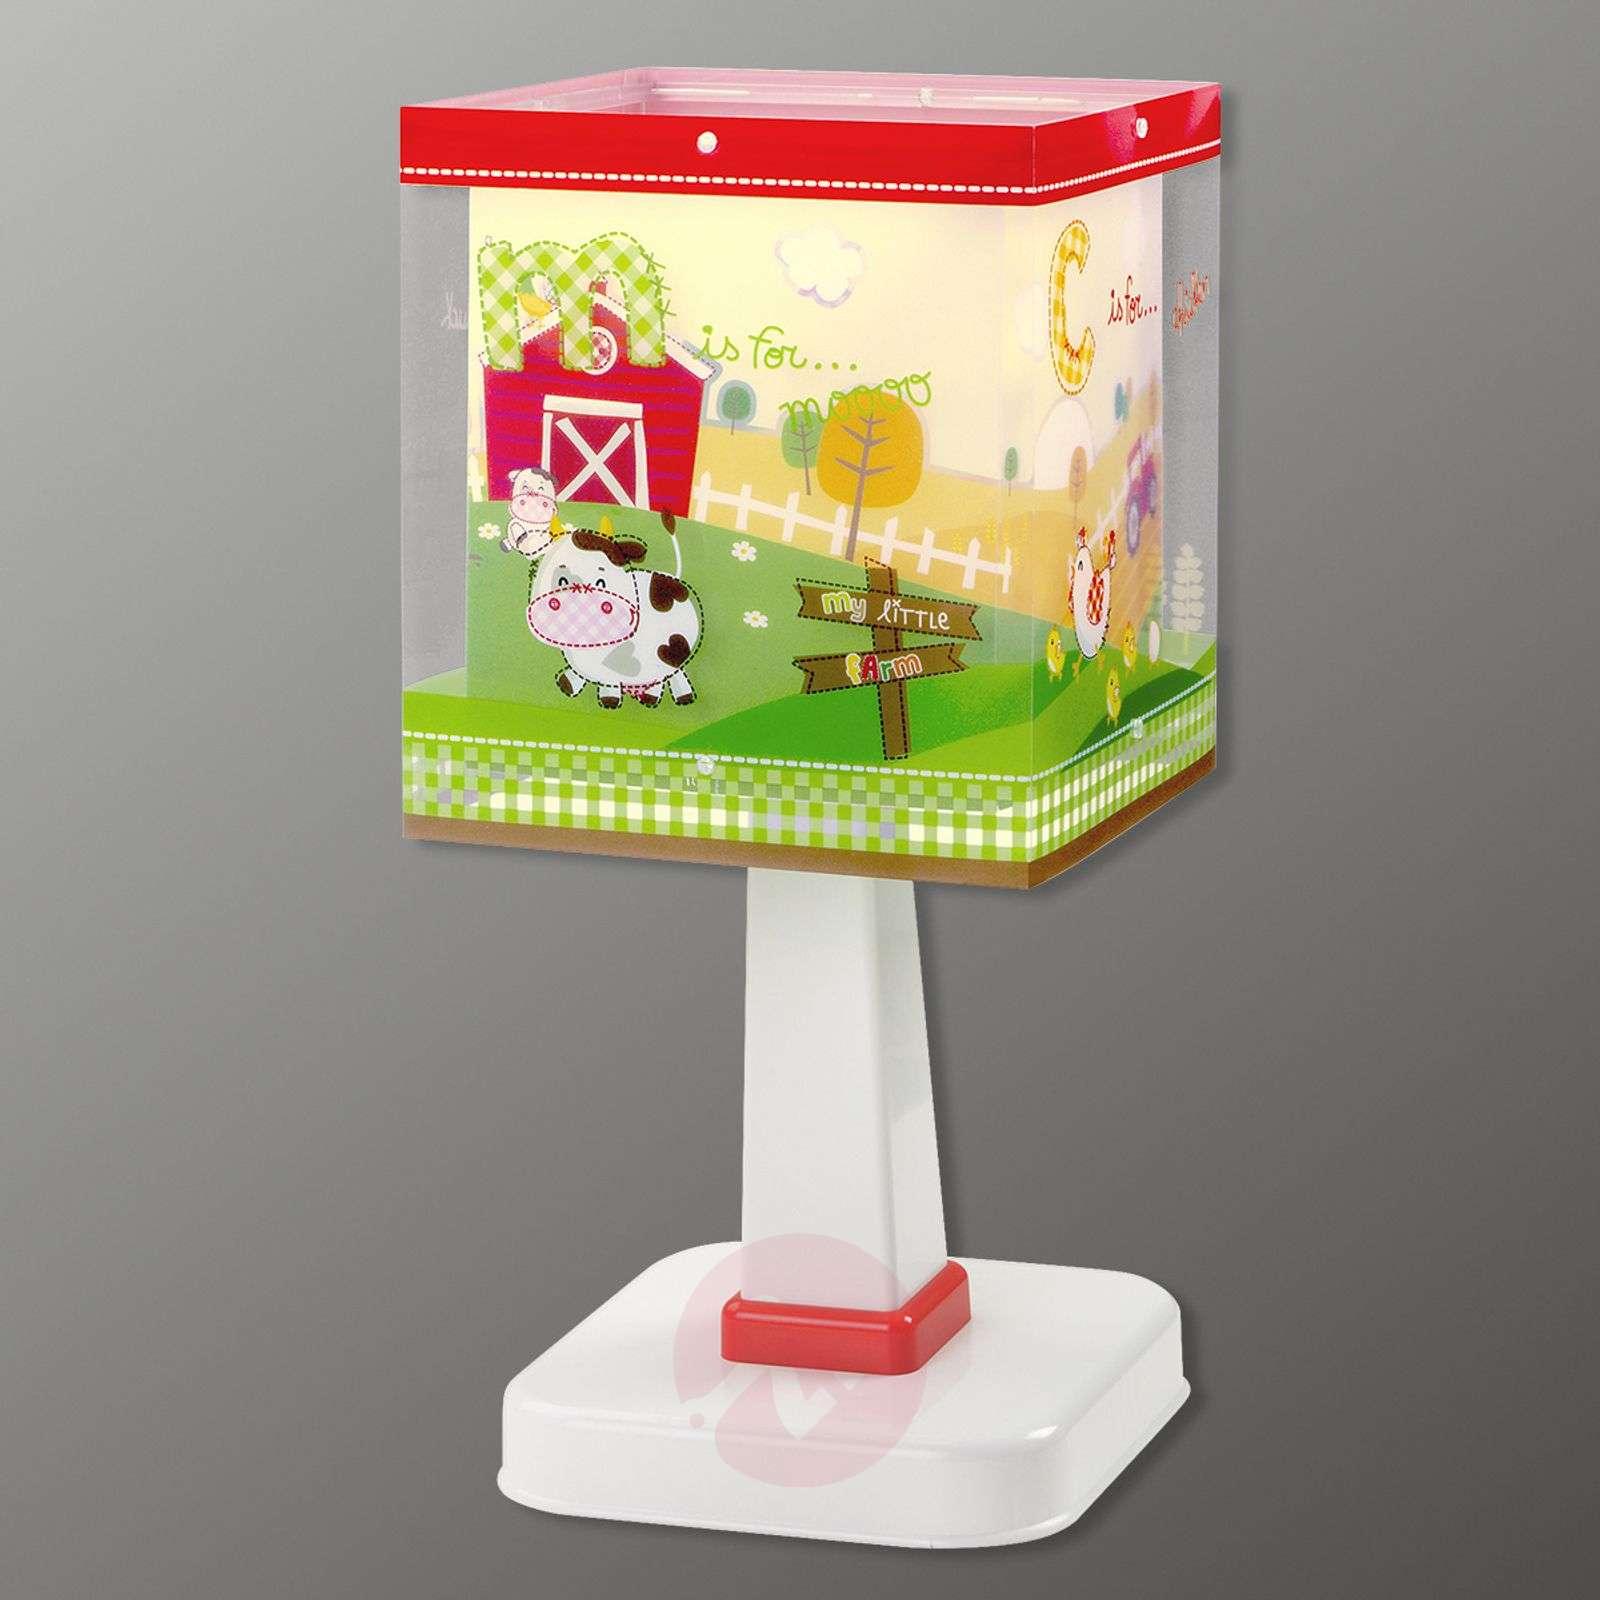 My Little Farm childrens table lamp-2507352-01